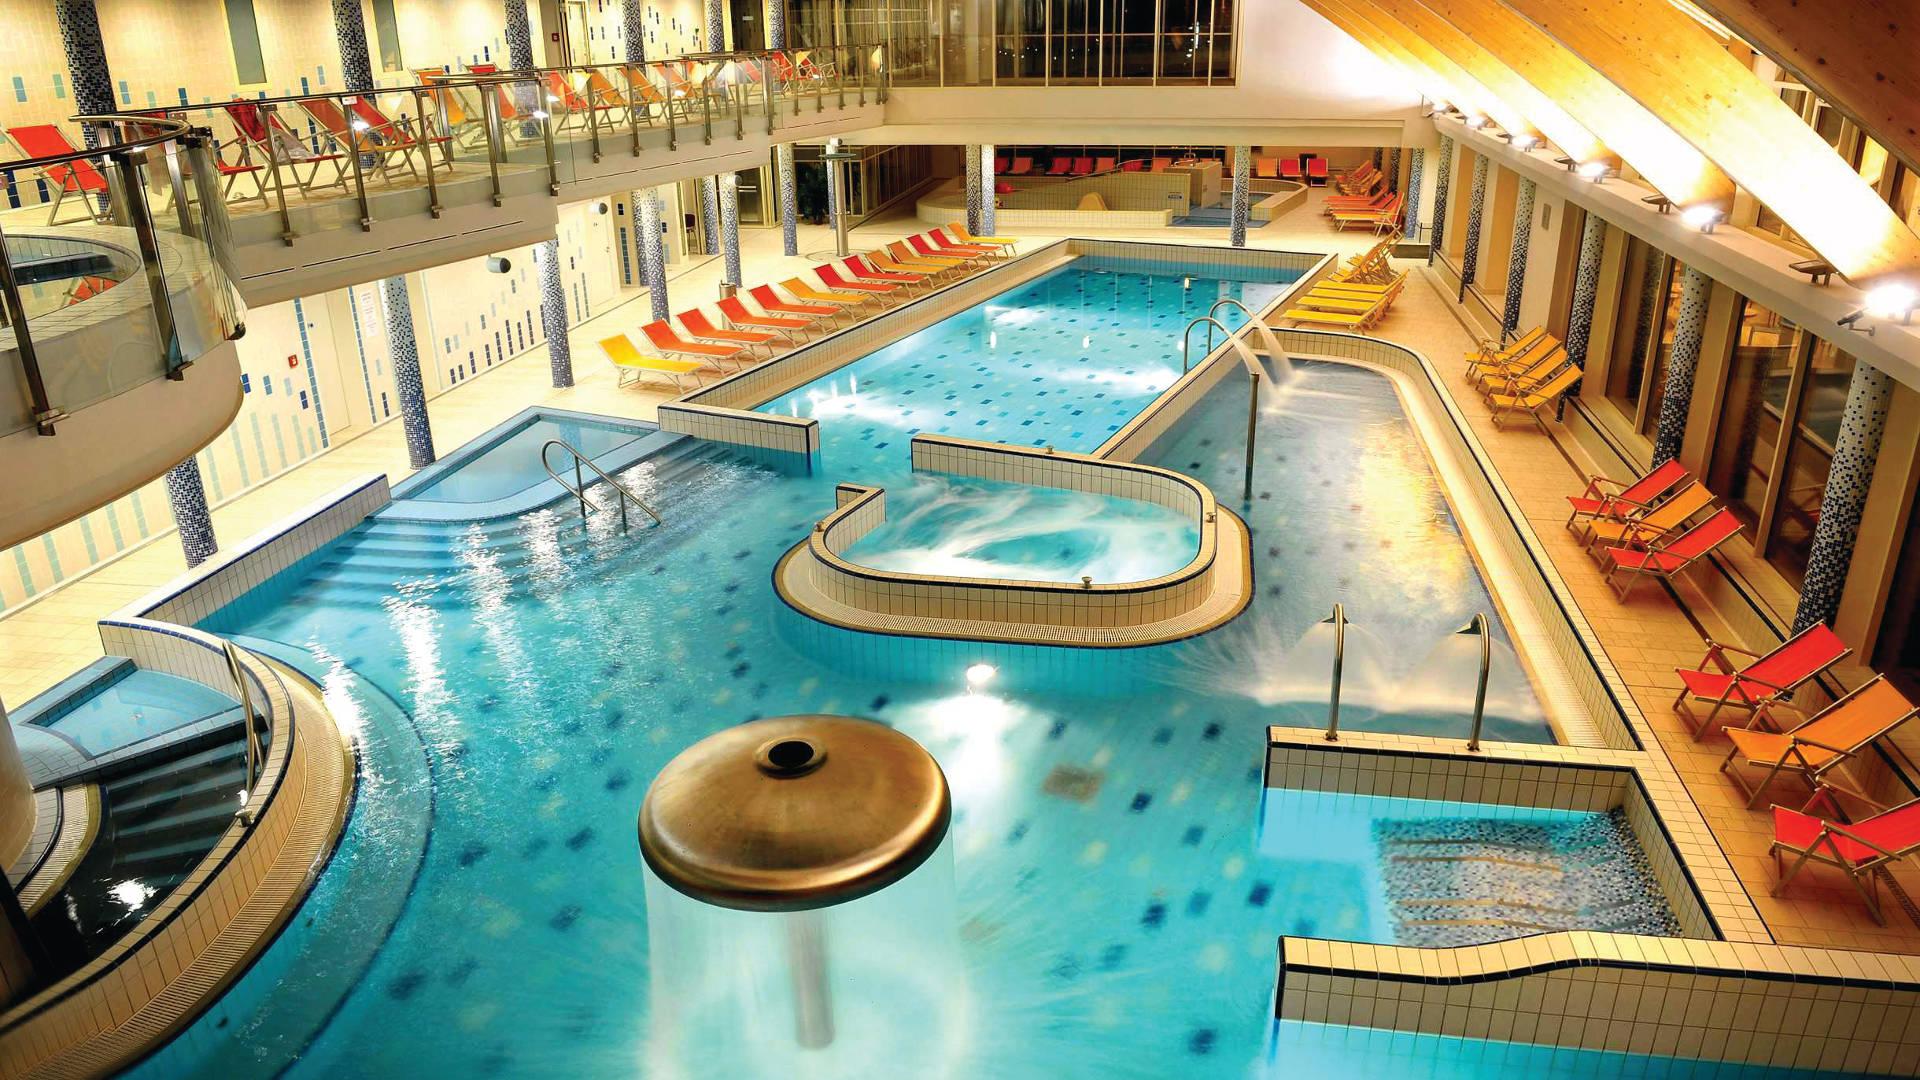 Velence Resort & Spa - Kép a medencéről